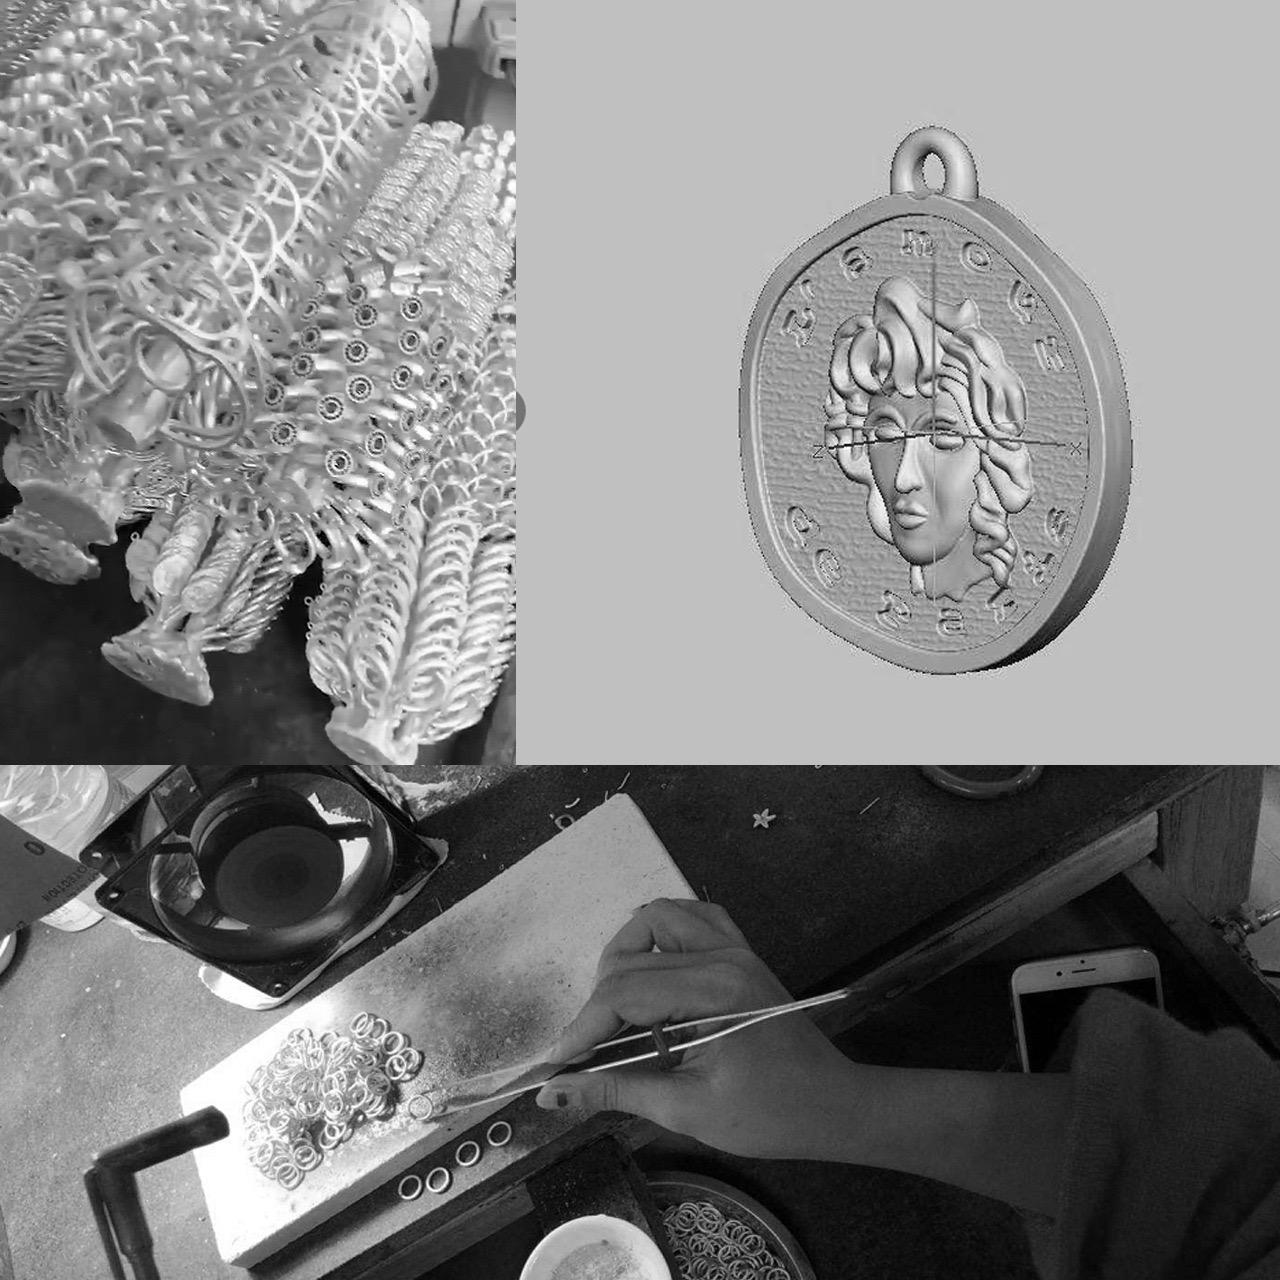 Fairy crown jewelry customized pure silver gilded gemstone inlay original design silver